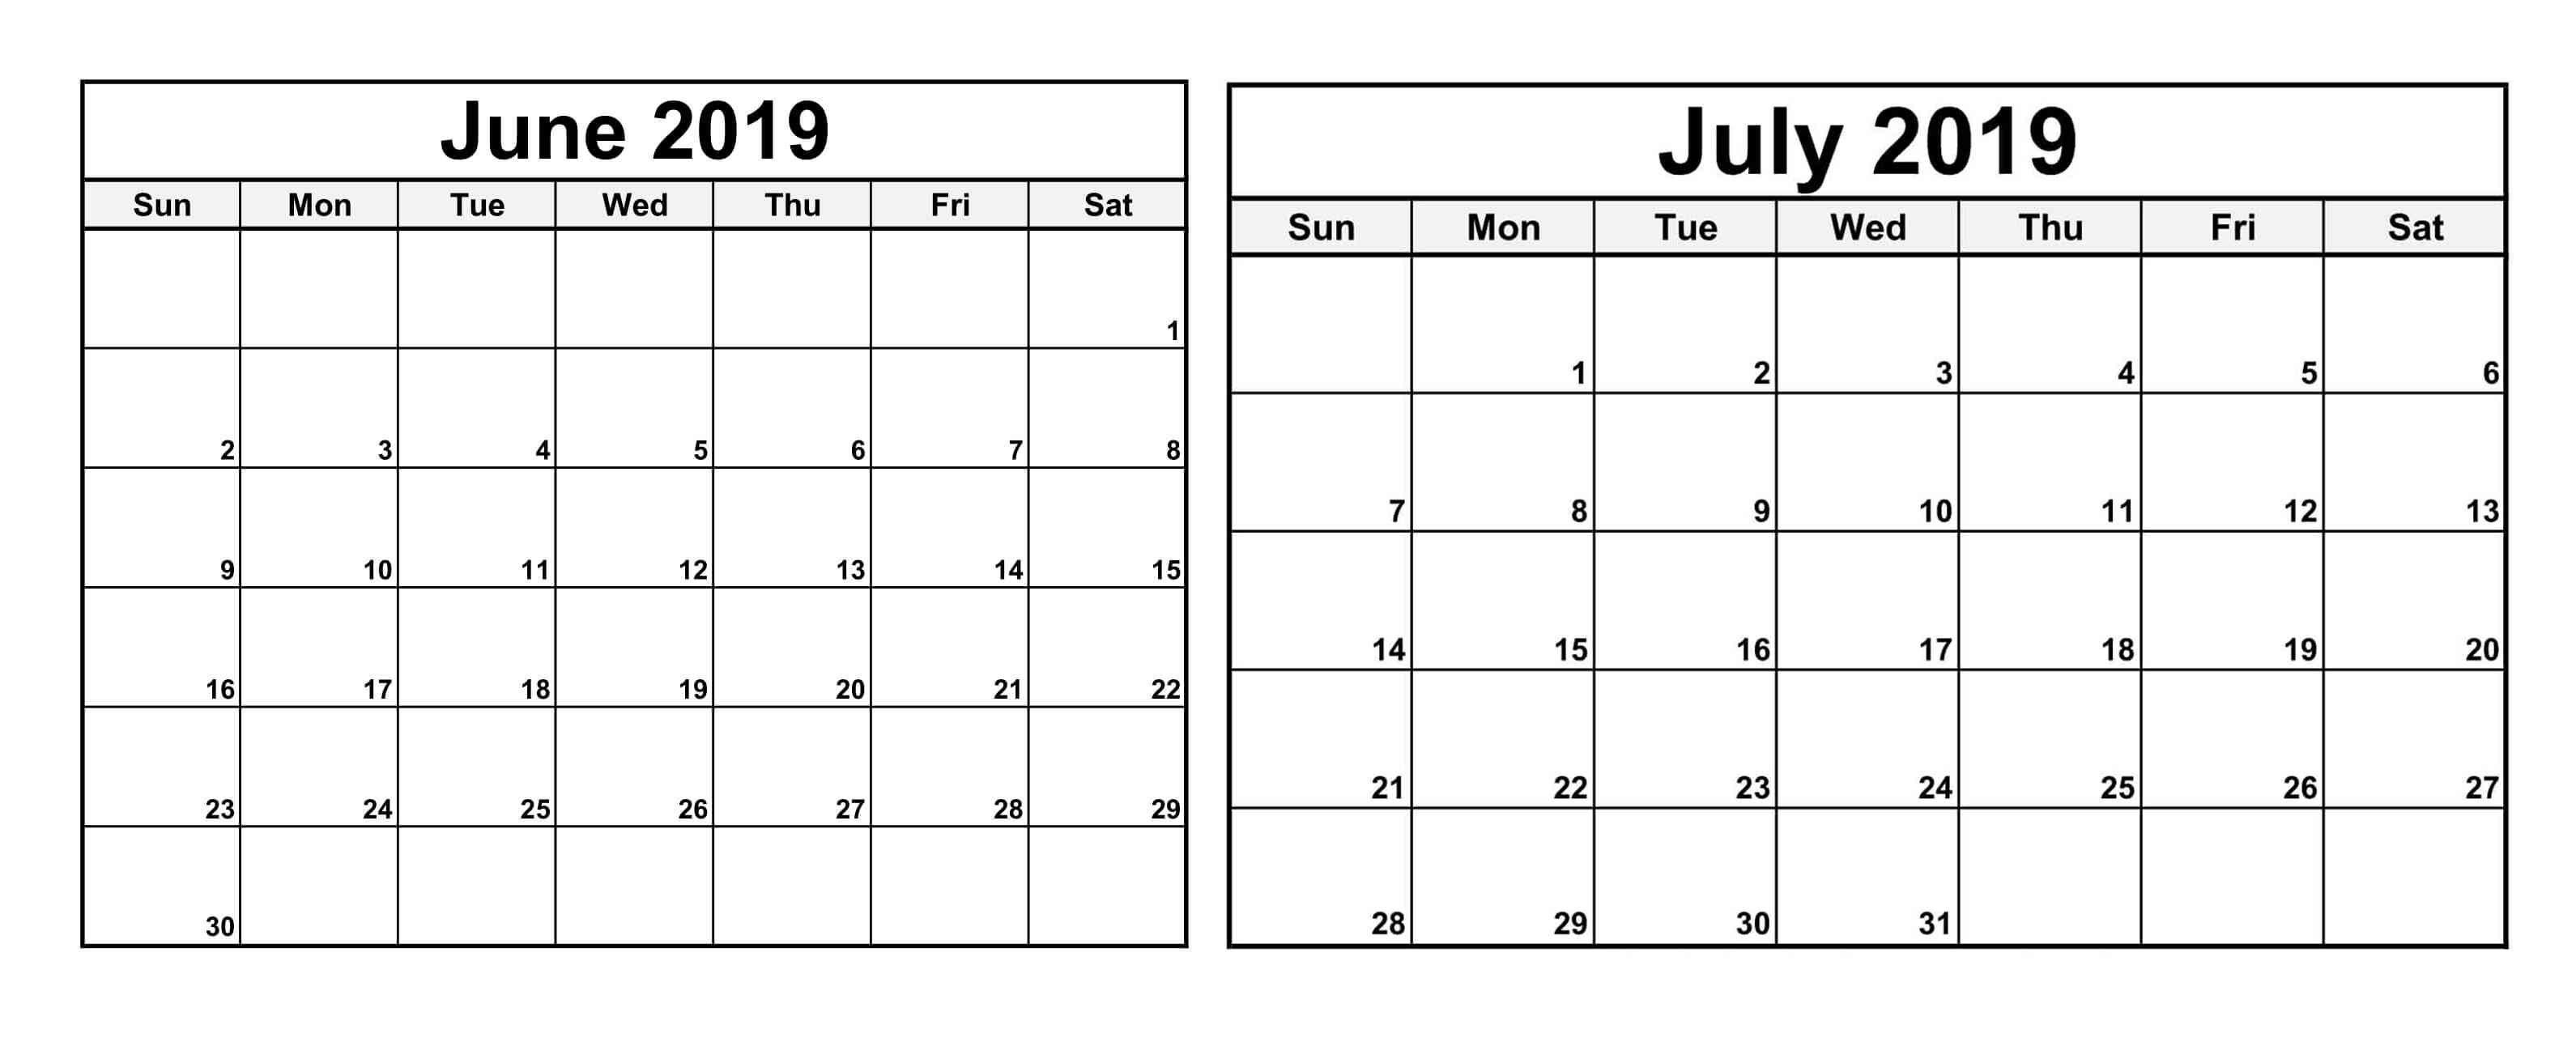 June July 2019 Calendar With Holiday – Magic Calendar 2019 Printable Calendar 2019 June July